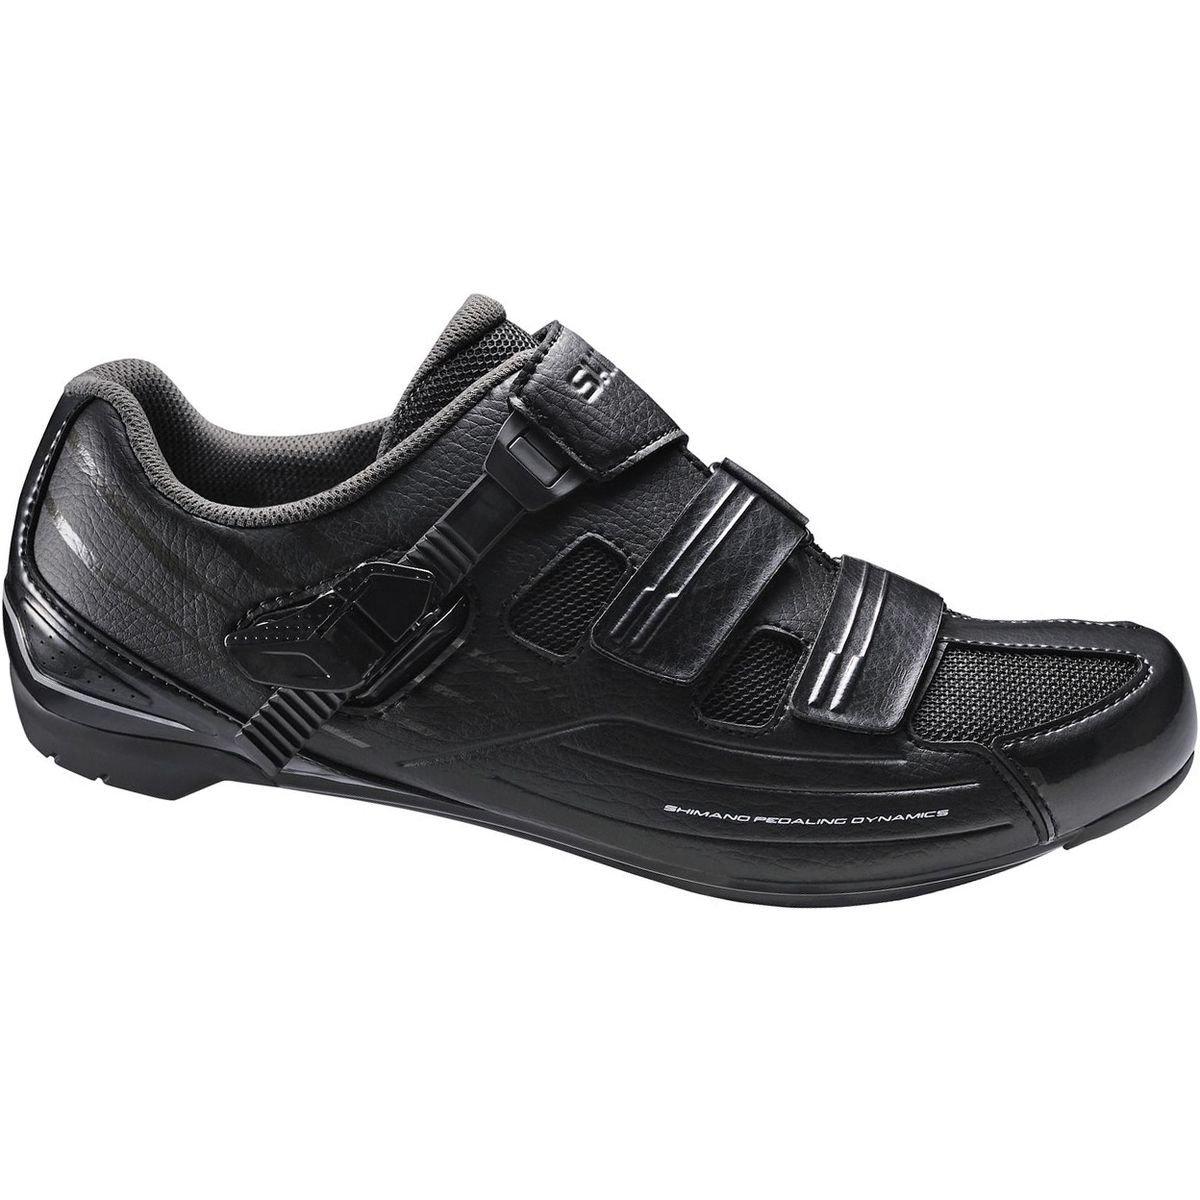 Shimano Men's RP3 Black Road Cycling Shoes - 40 by Shimano